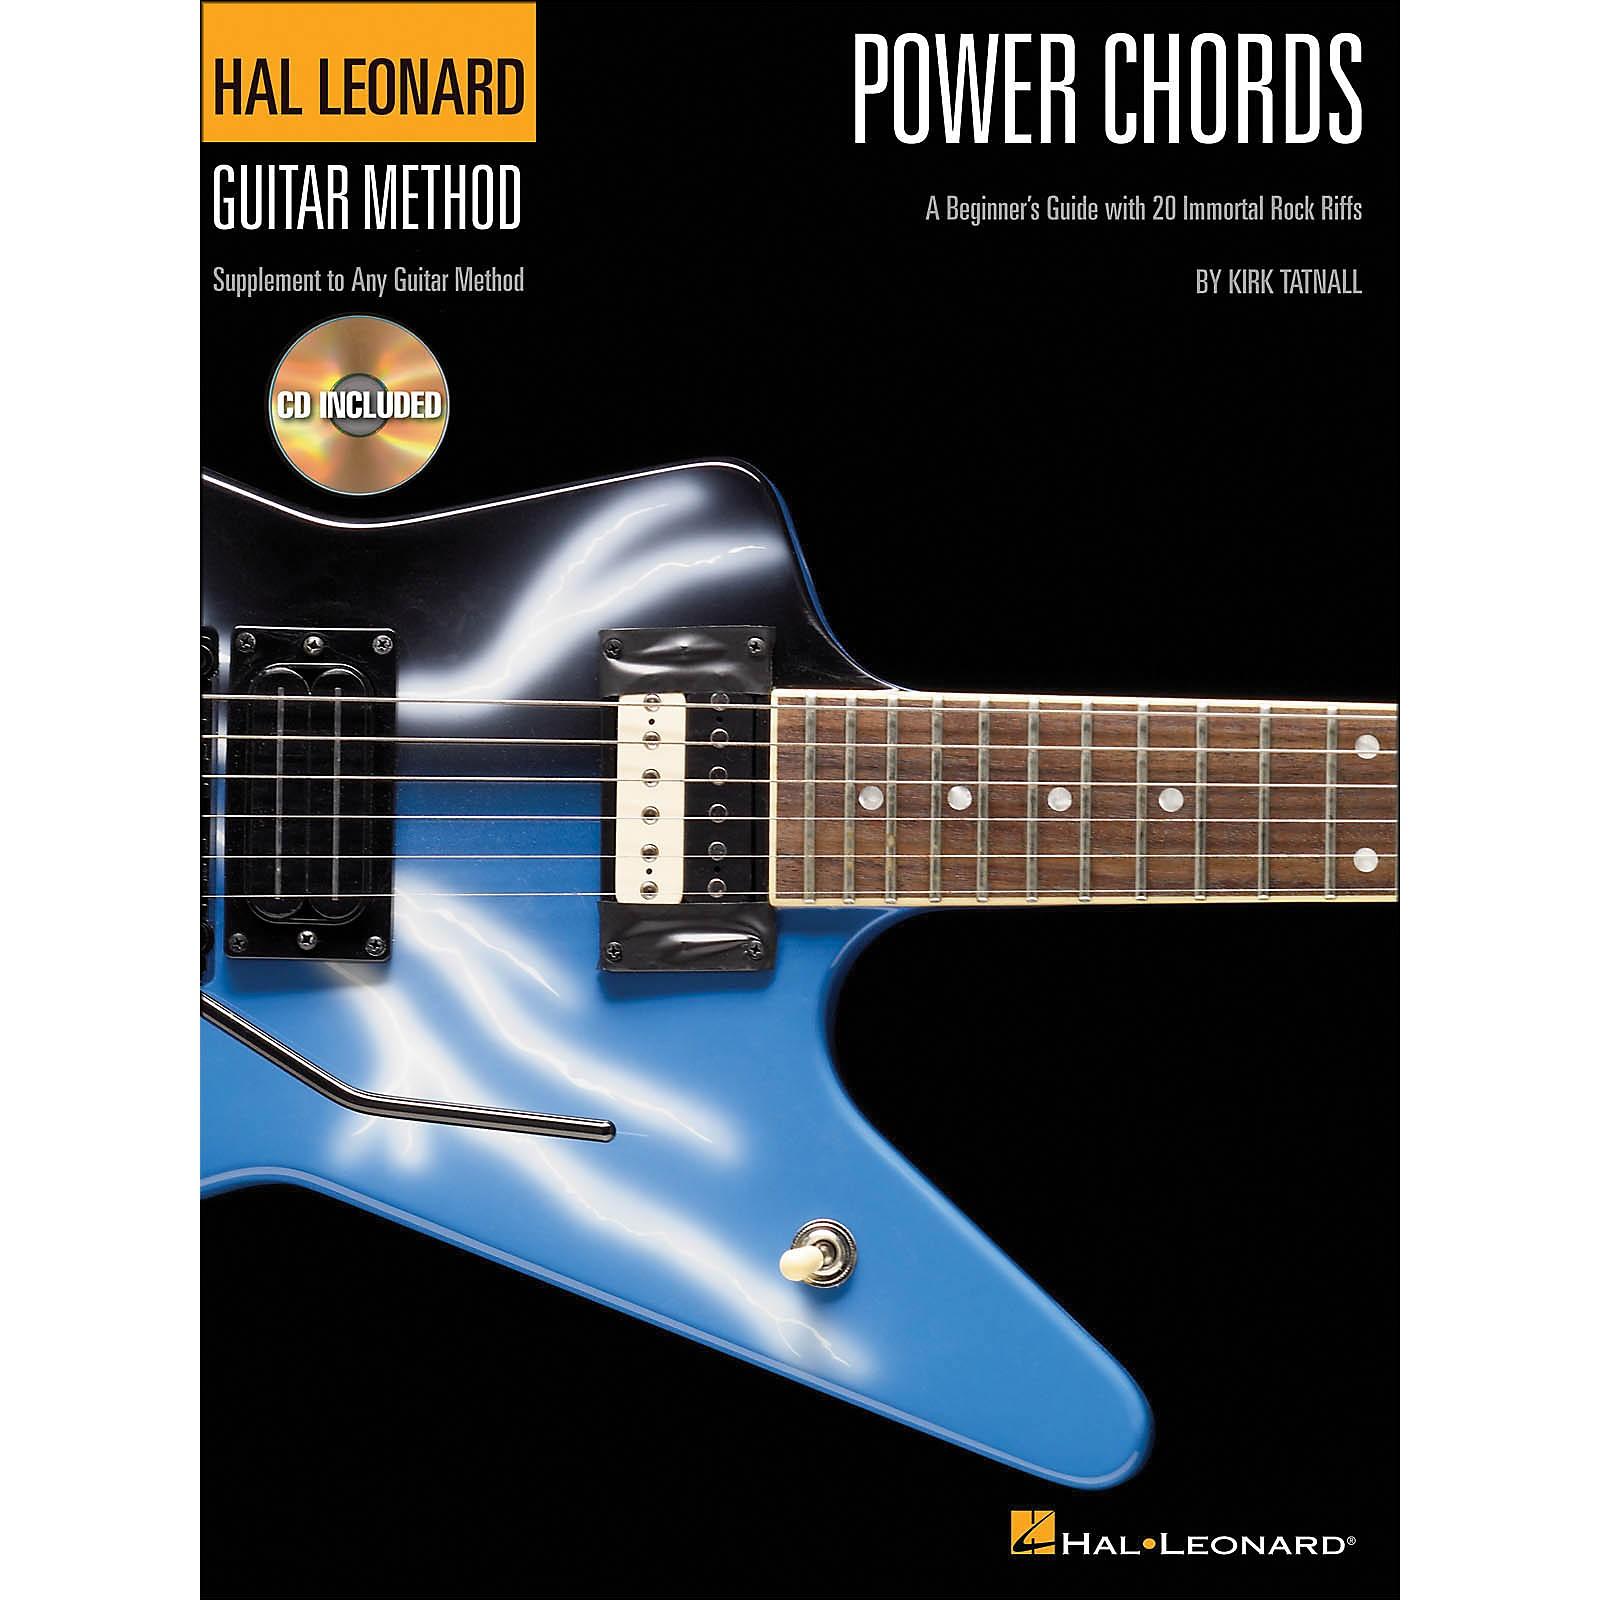 Hal Leonard Power Chords (Book/Online Audio) - Hal Leonard Guitar Method Supplement